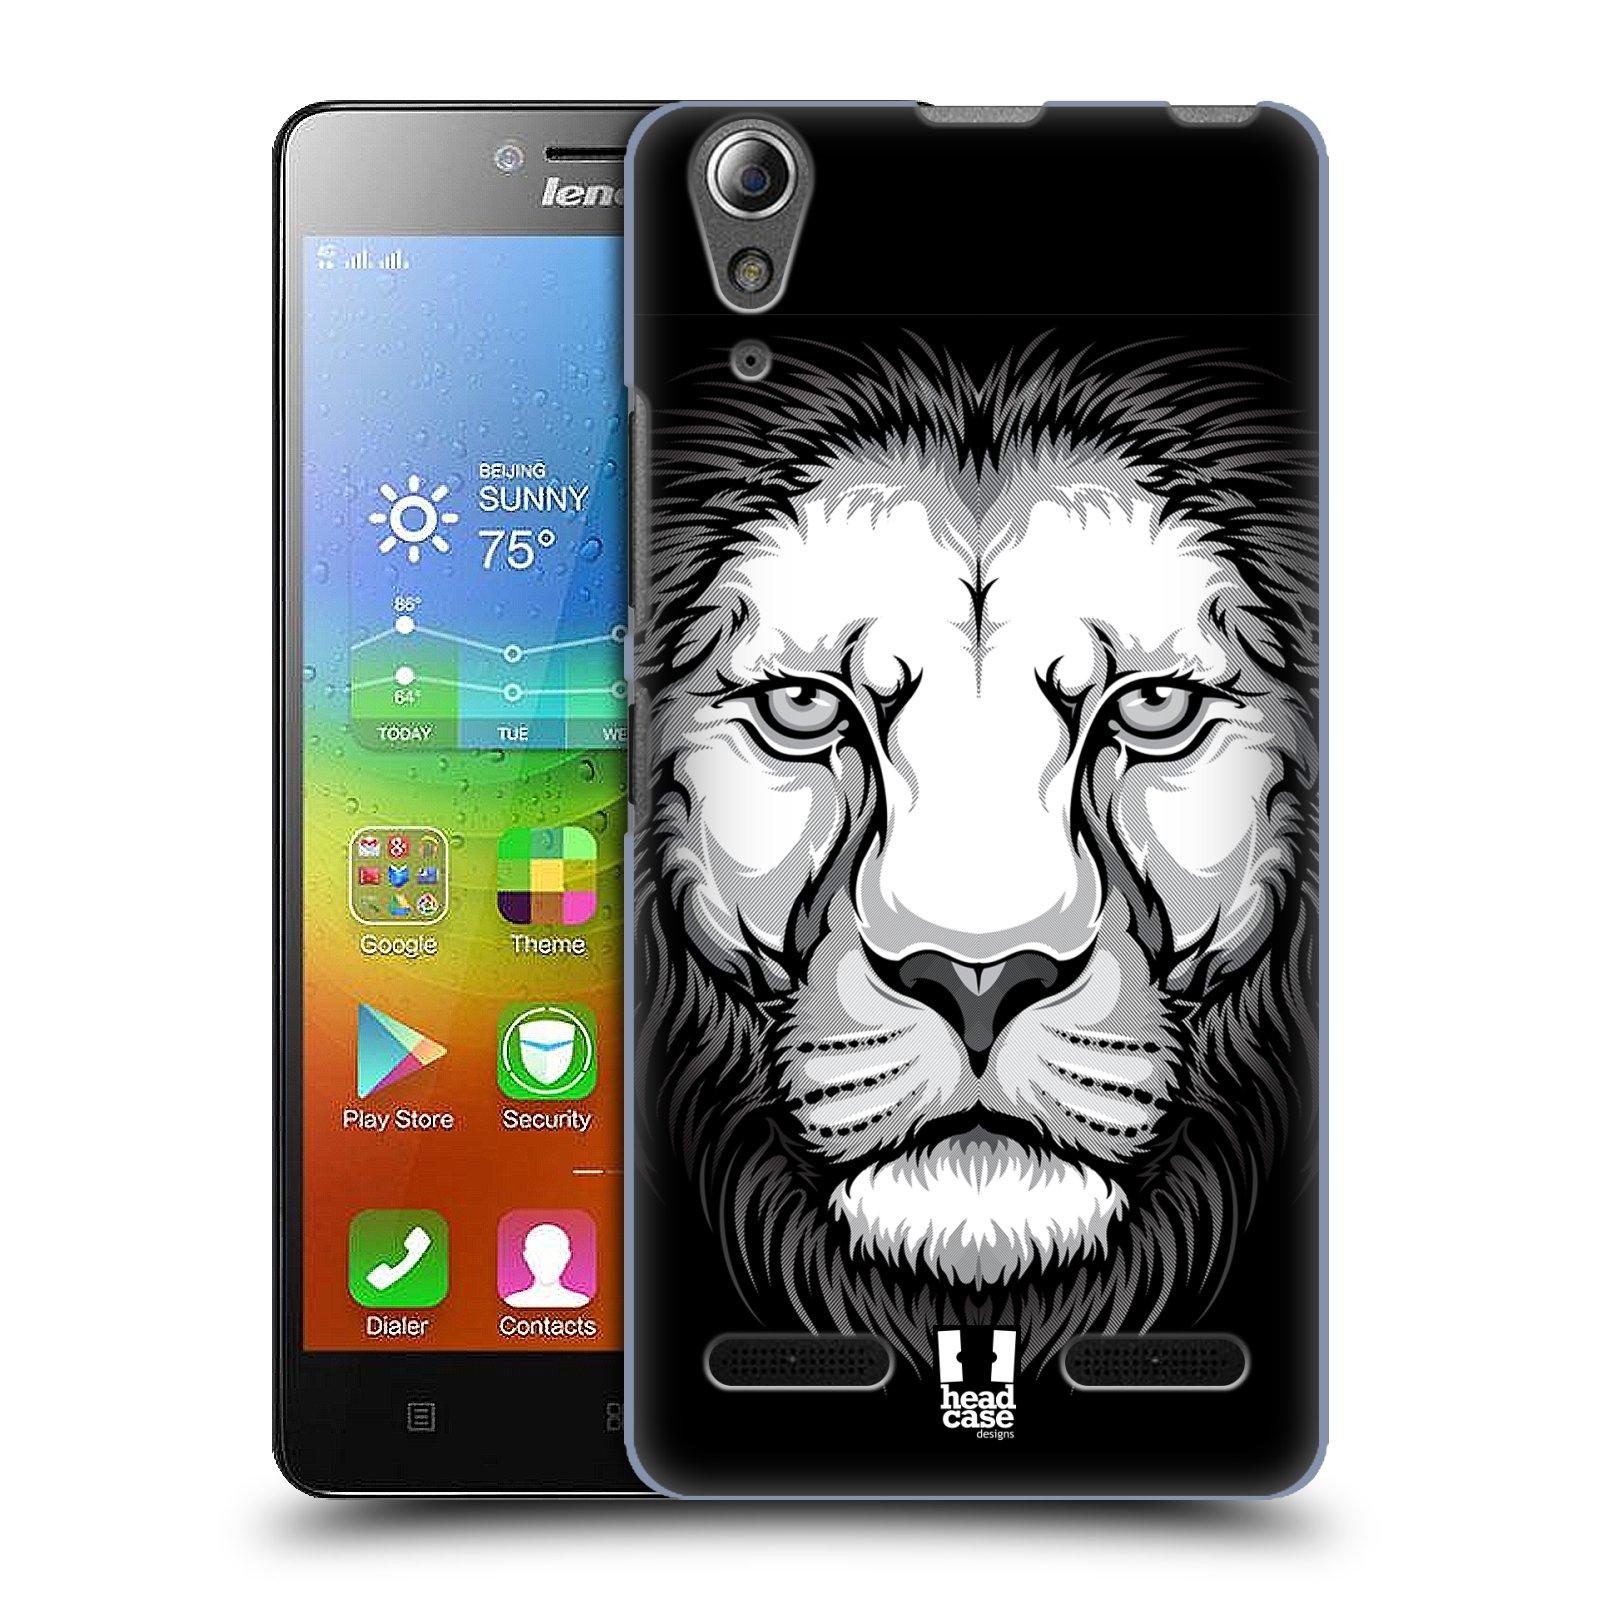 HEAD CASE pevný plastový obal na mobil LENOVO A6000 / A6000 PLUS vzor Zvíře kreslená tvář lev